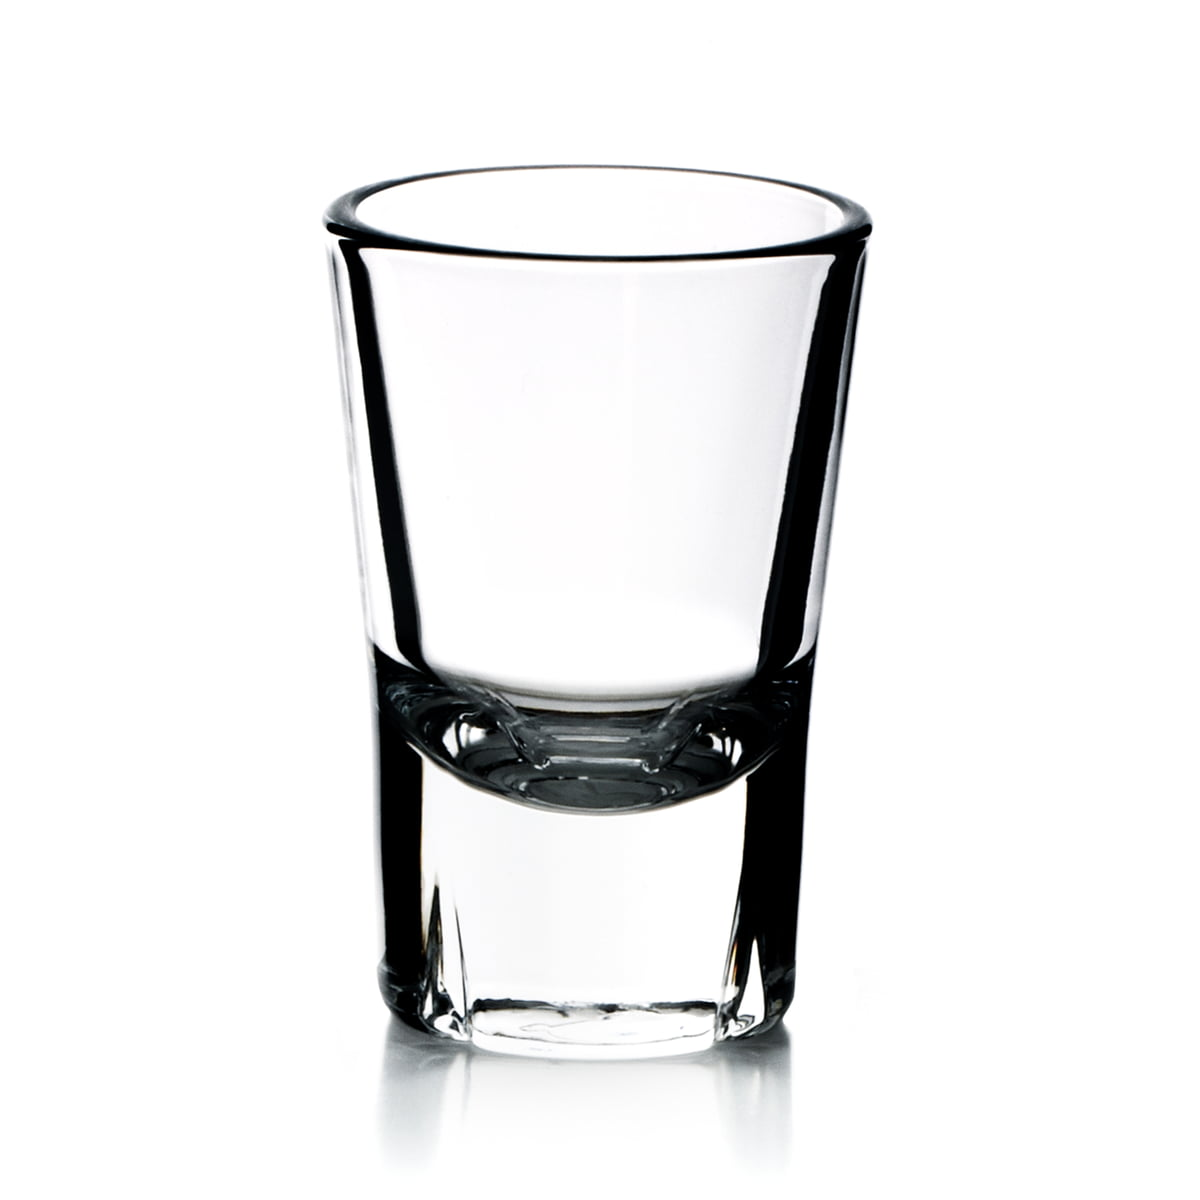 Schnapsglas Cl